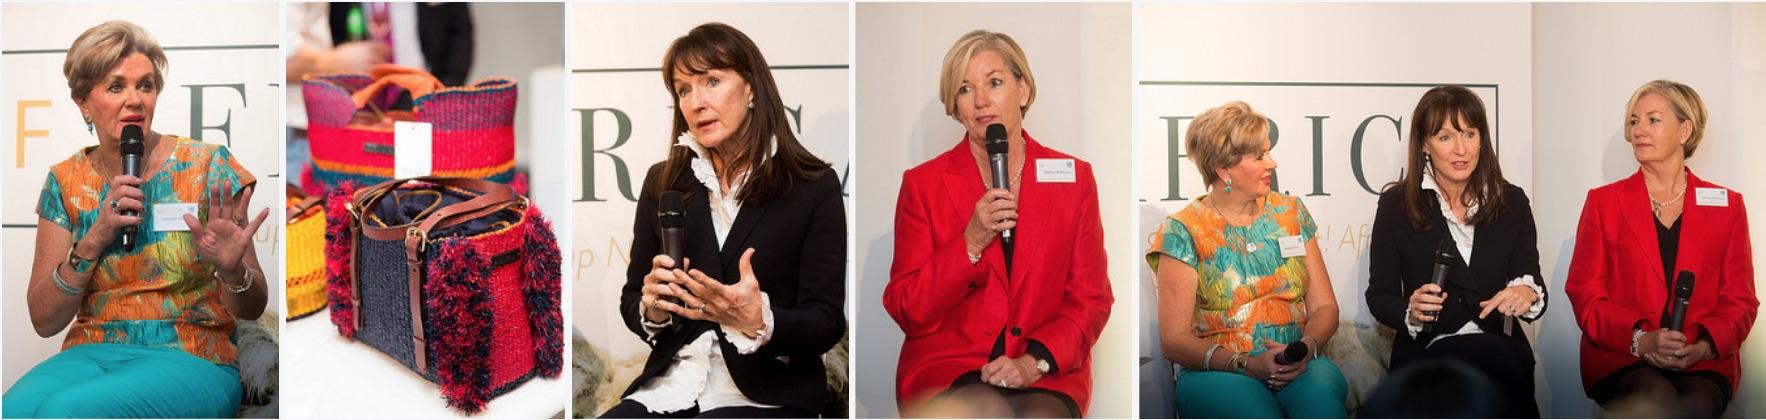 Leading Brand Builders Panel with Margaret Hirsch, Bernie de le Cuona & Brenda Wilkinson